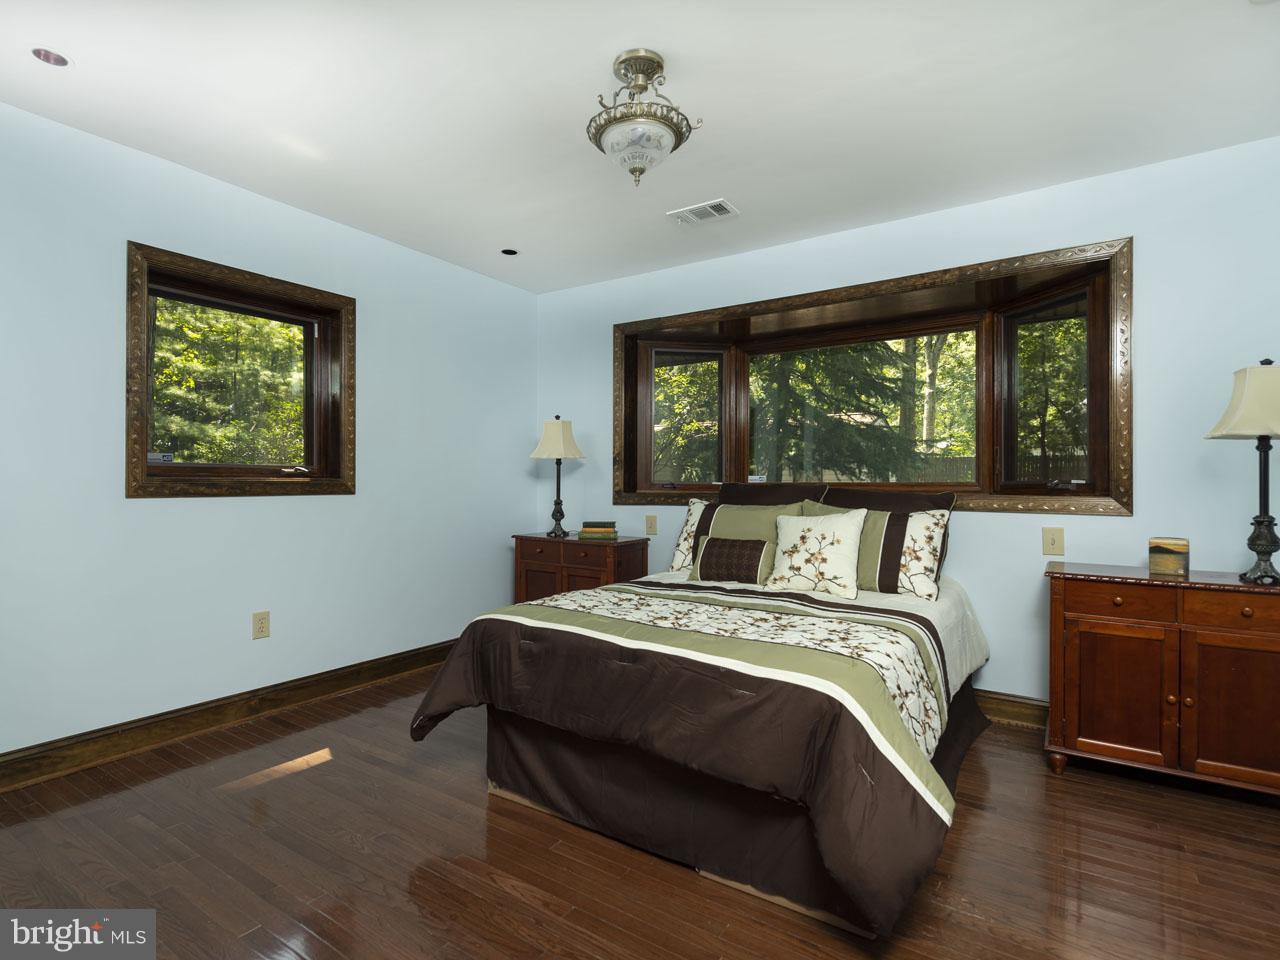 1002303700-300502419404-2021-07-22-03-27-23  |   | Alexandria Delaware Real Estate For Sale | MLS# 1002303700  - Best of Northern Virginia